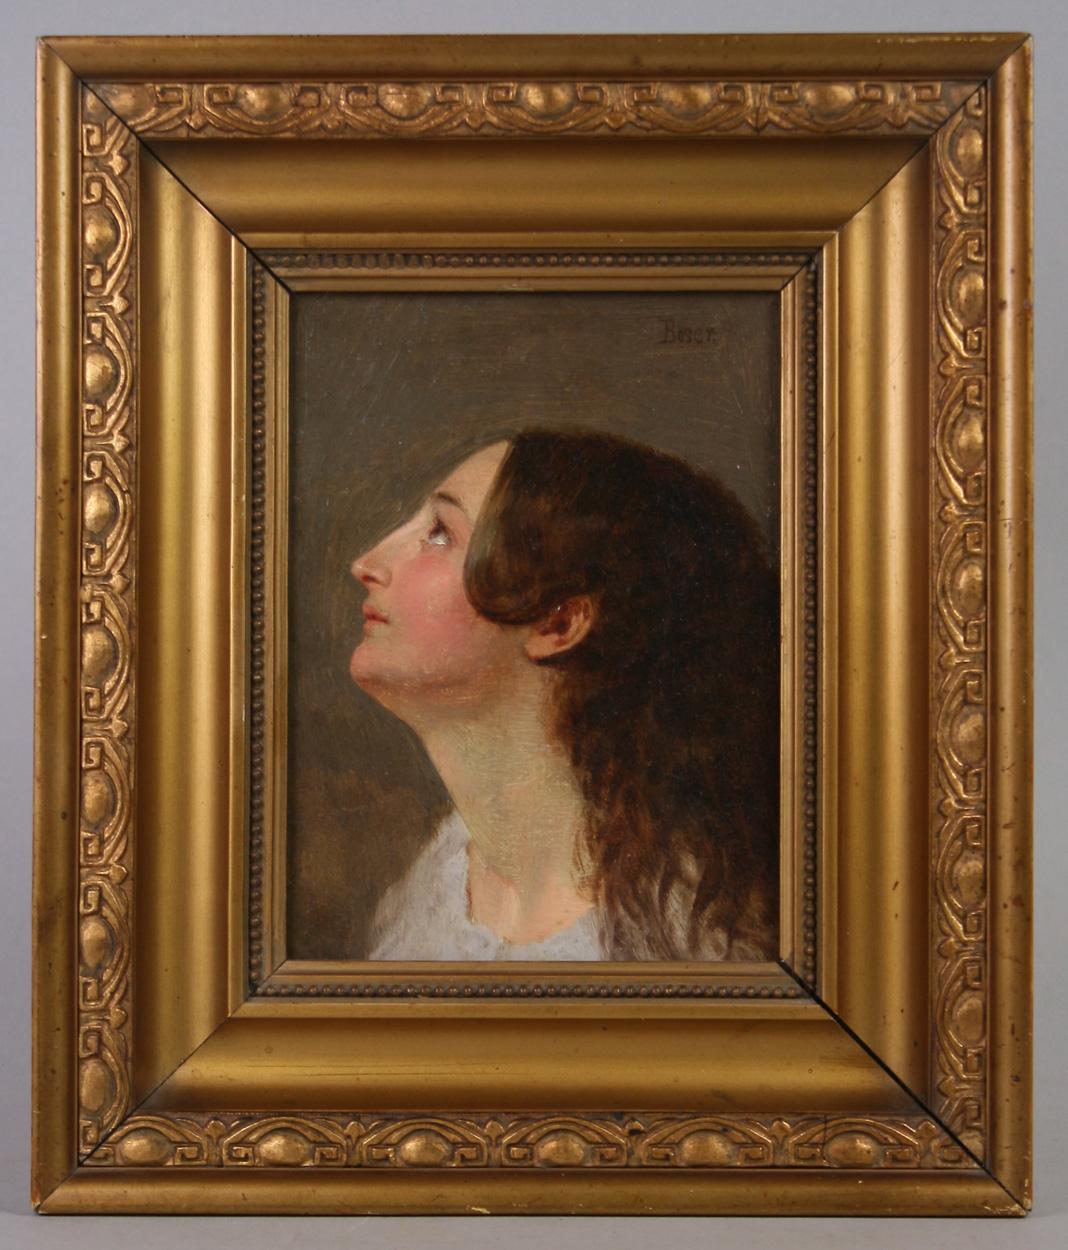 Friedrich Boser, Frauenkopf im Profil